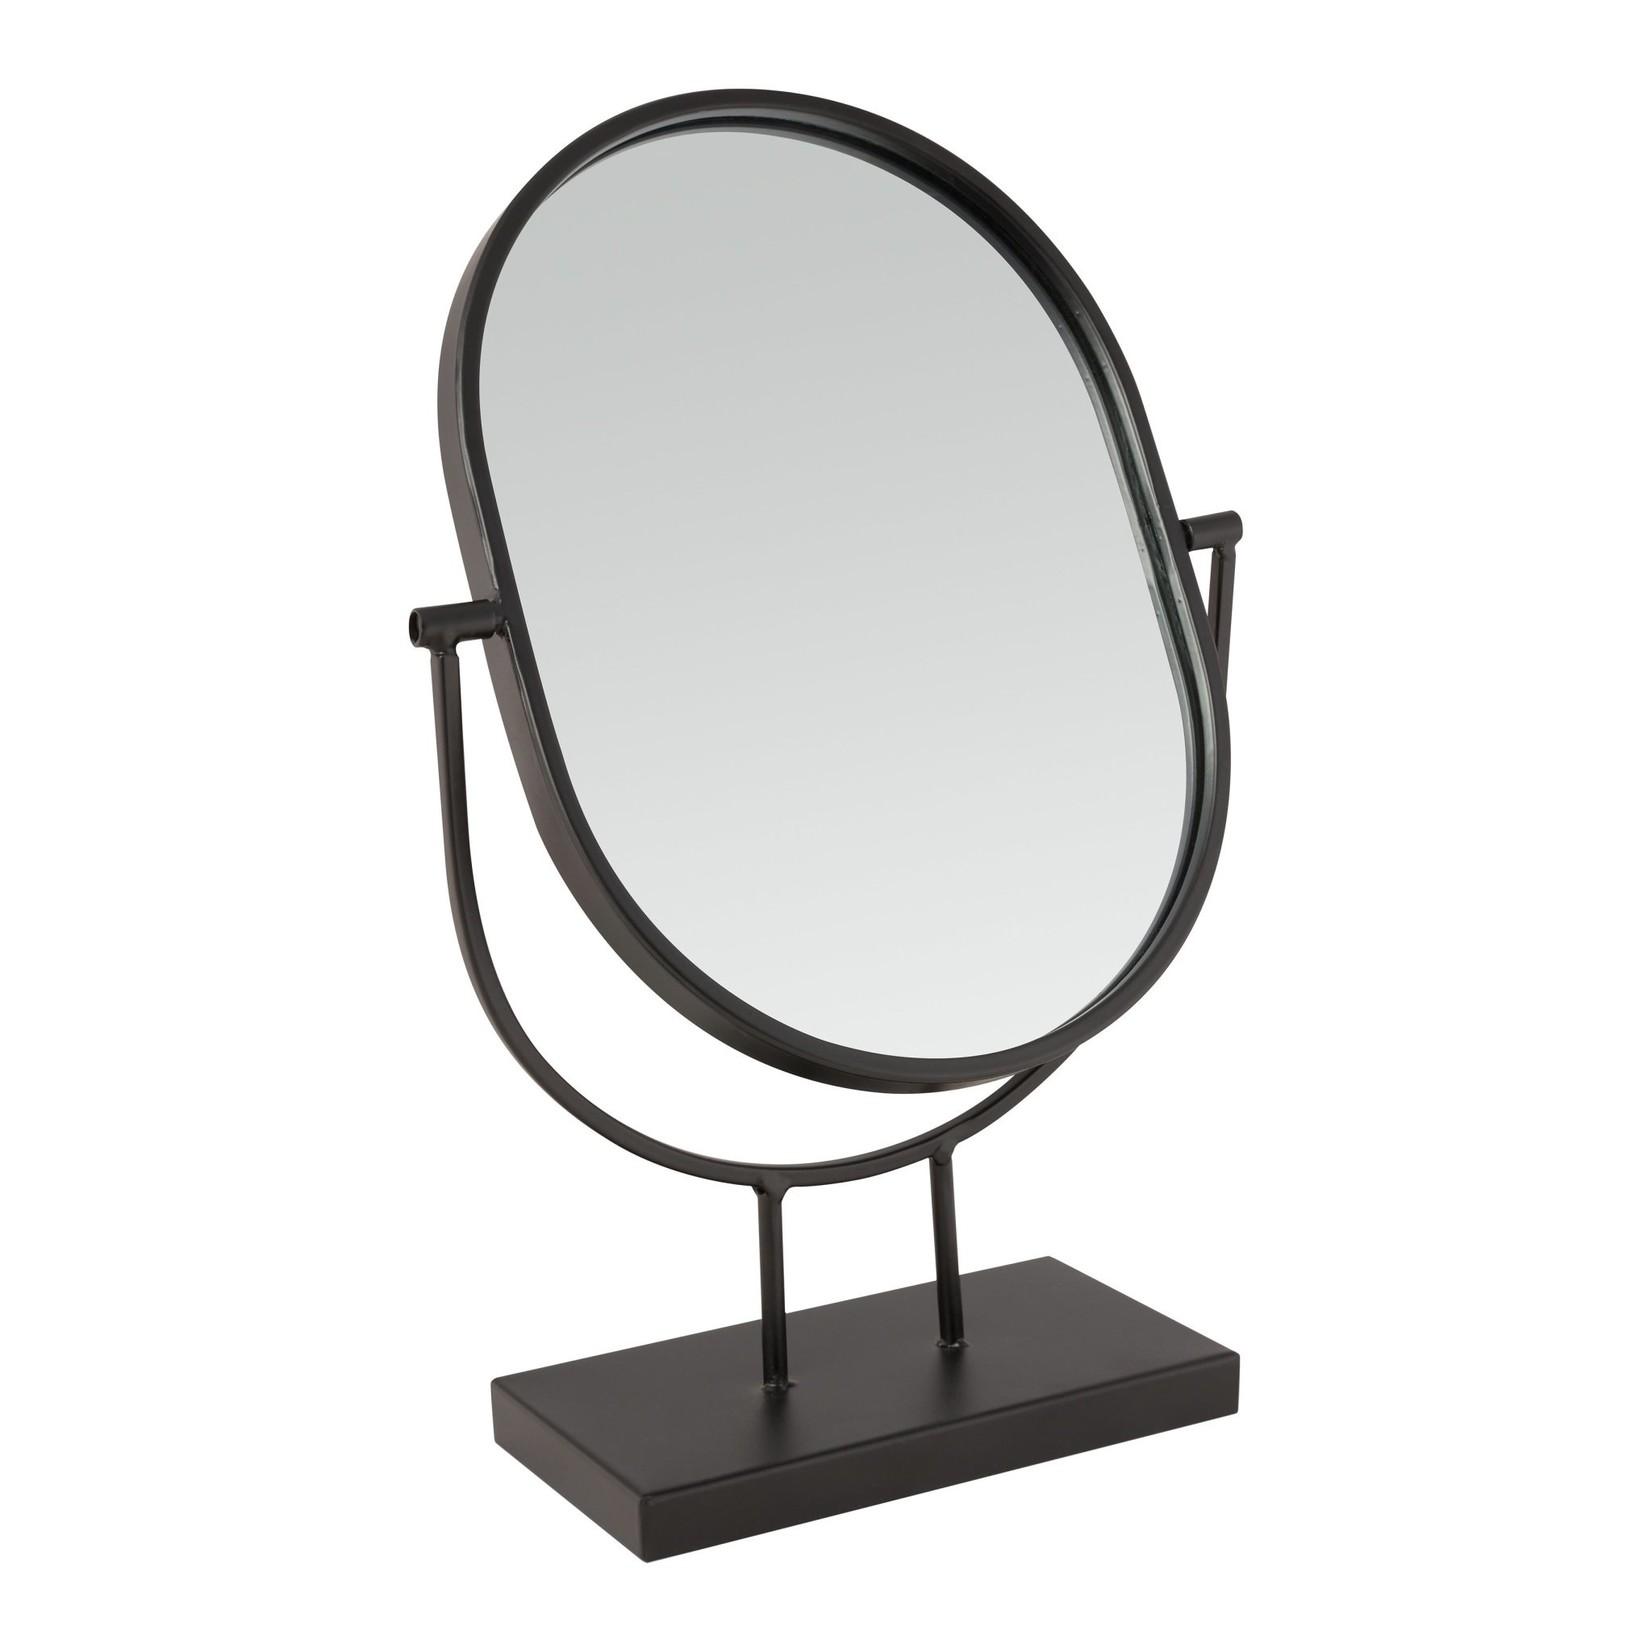 vtwonen Vtwonen Mirror Oval on Stand Black 20.3x31.1x8.5cm